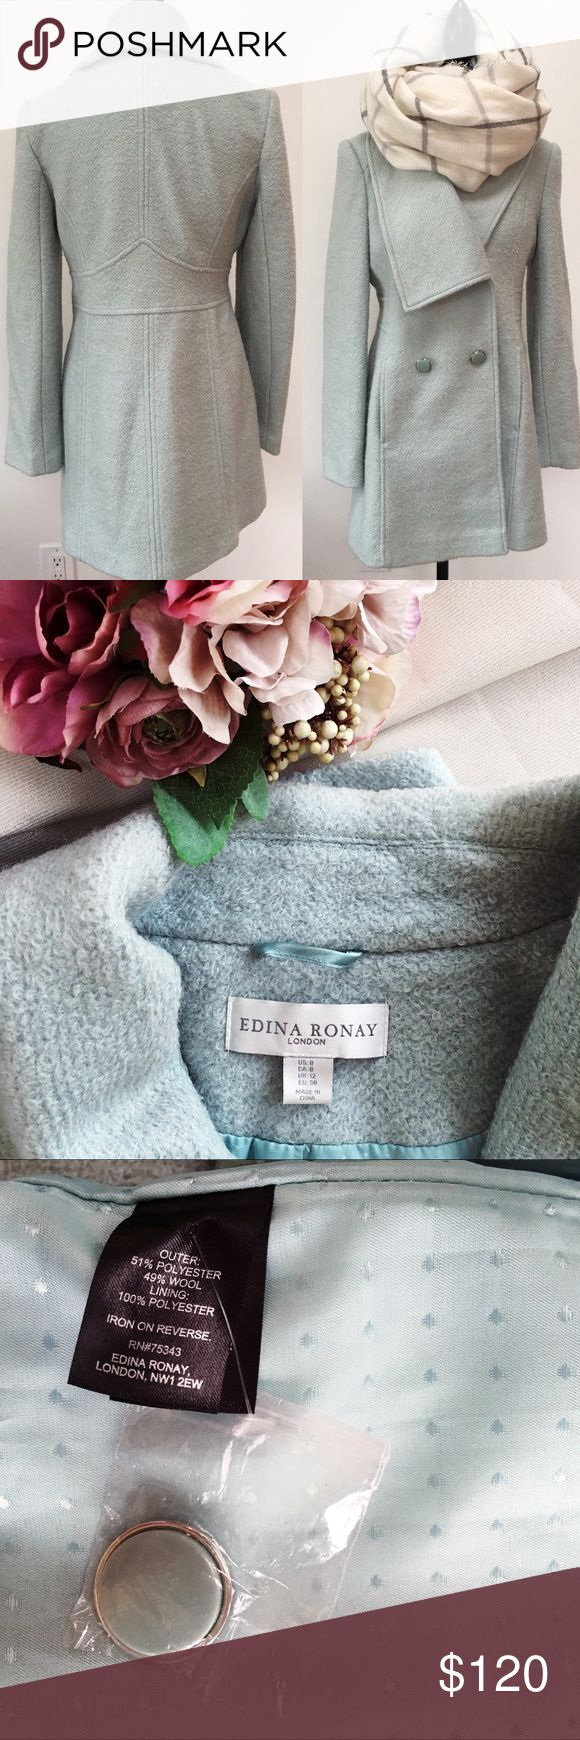 NWOT Edina Ronay London Peacoat New without tags!! Gorgeous mint Peacoat by Edina Ronay London! No stains or rips👌 Edina Ronay London Jackets & Coats Pea Coats